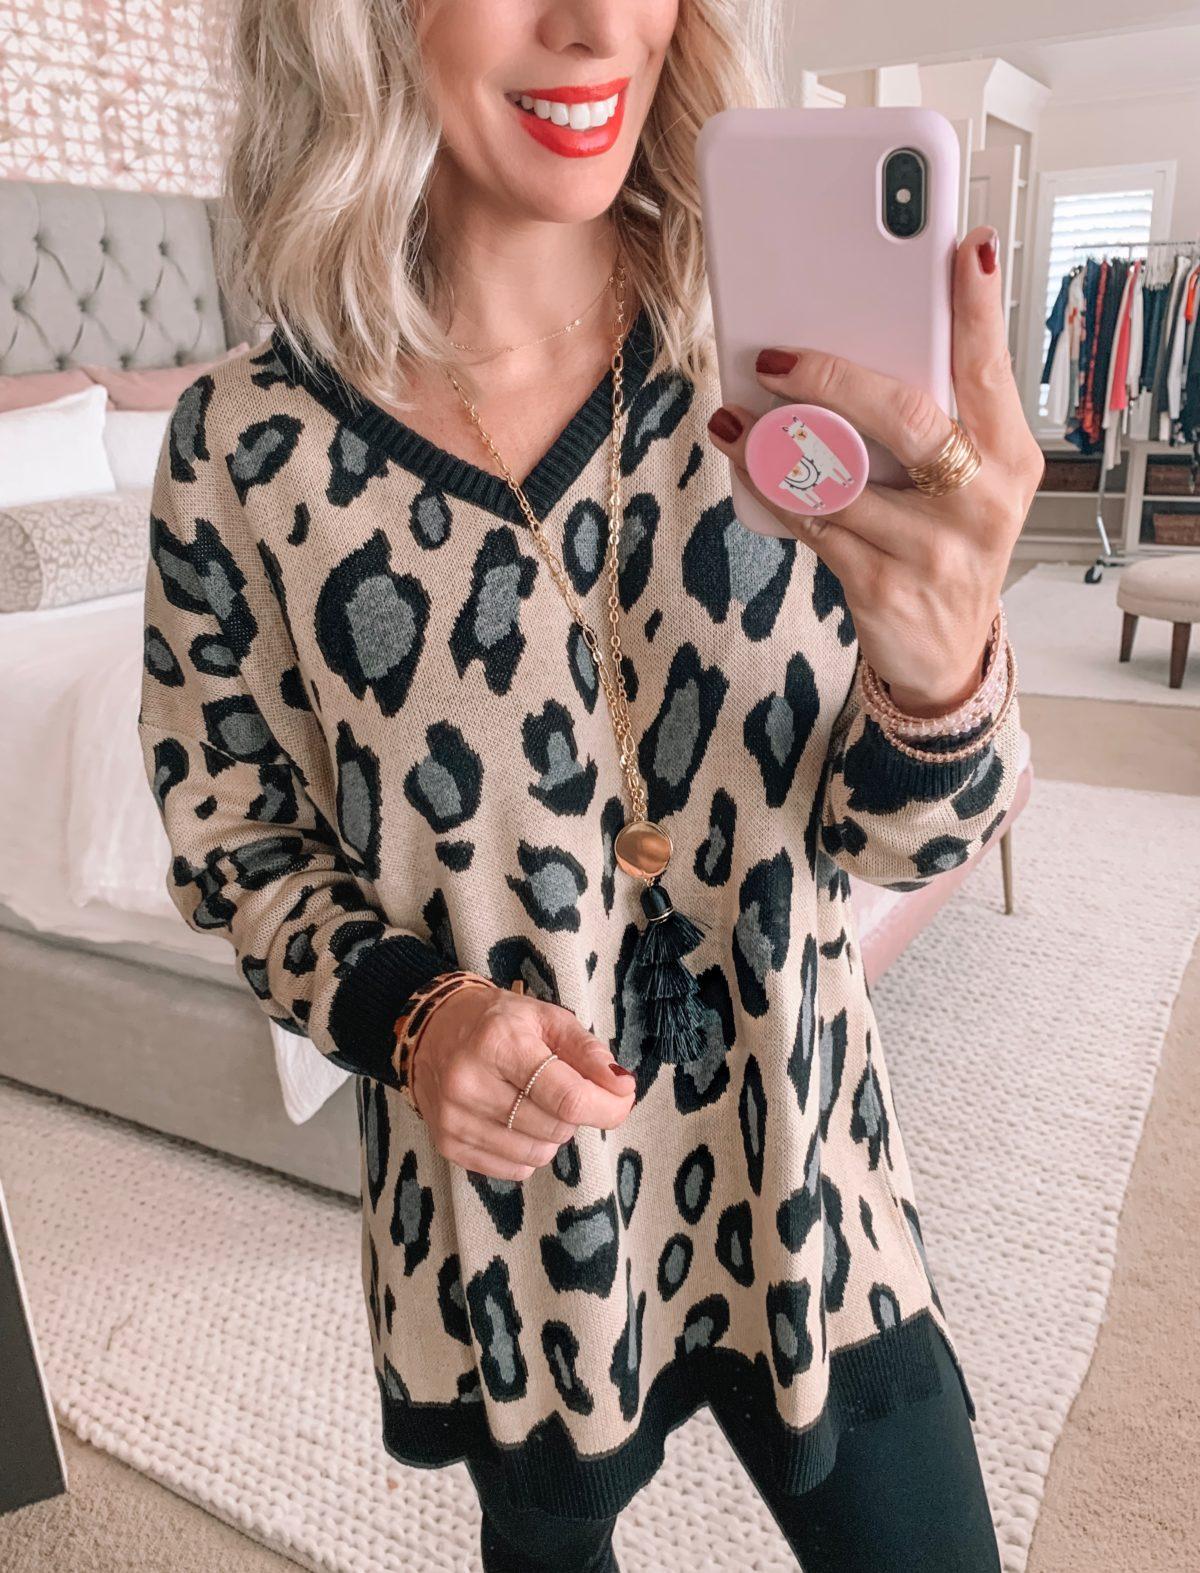 Amazon Prime Fashion- Leopard Sweater With Leggings